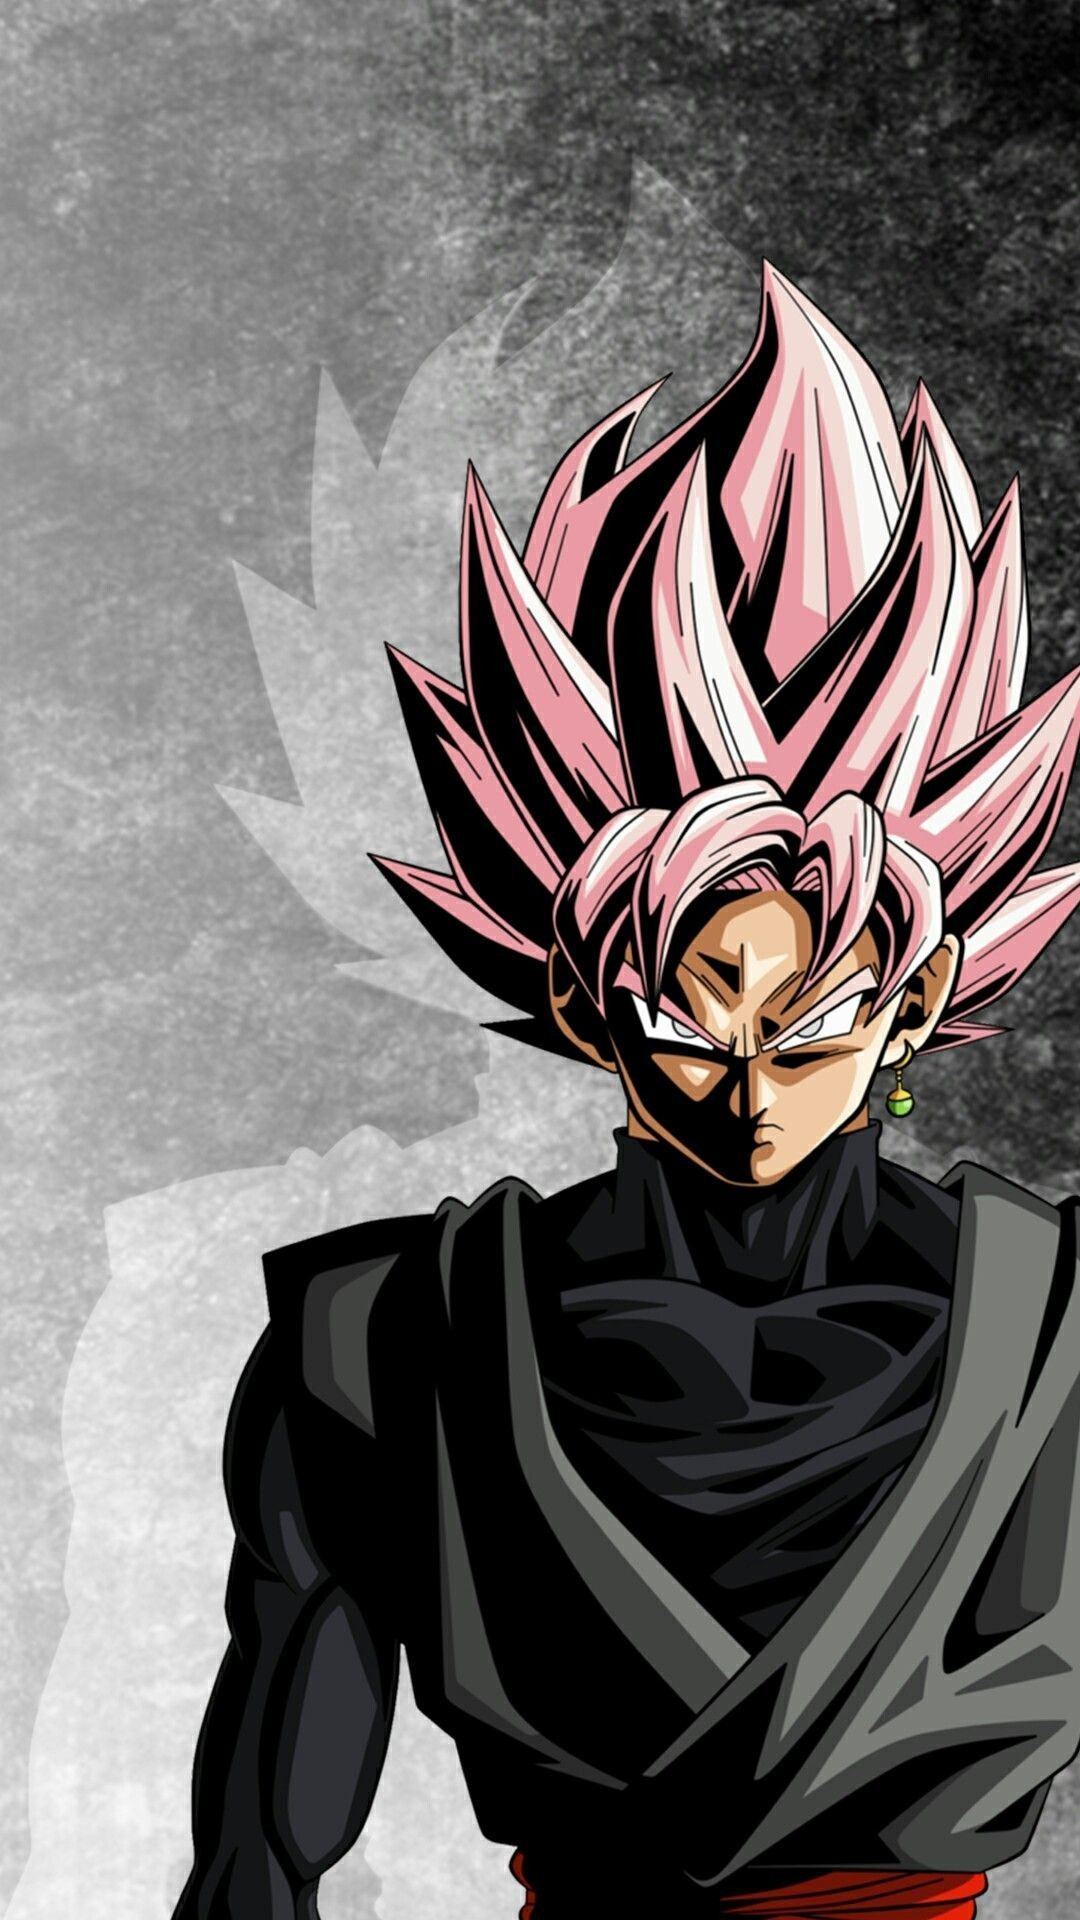 Black Goku in 2020 Goku black, Dragon ball wallpapers